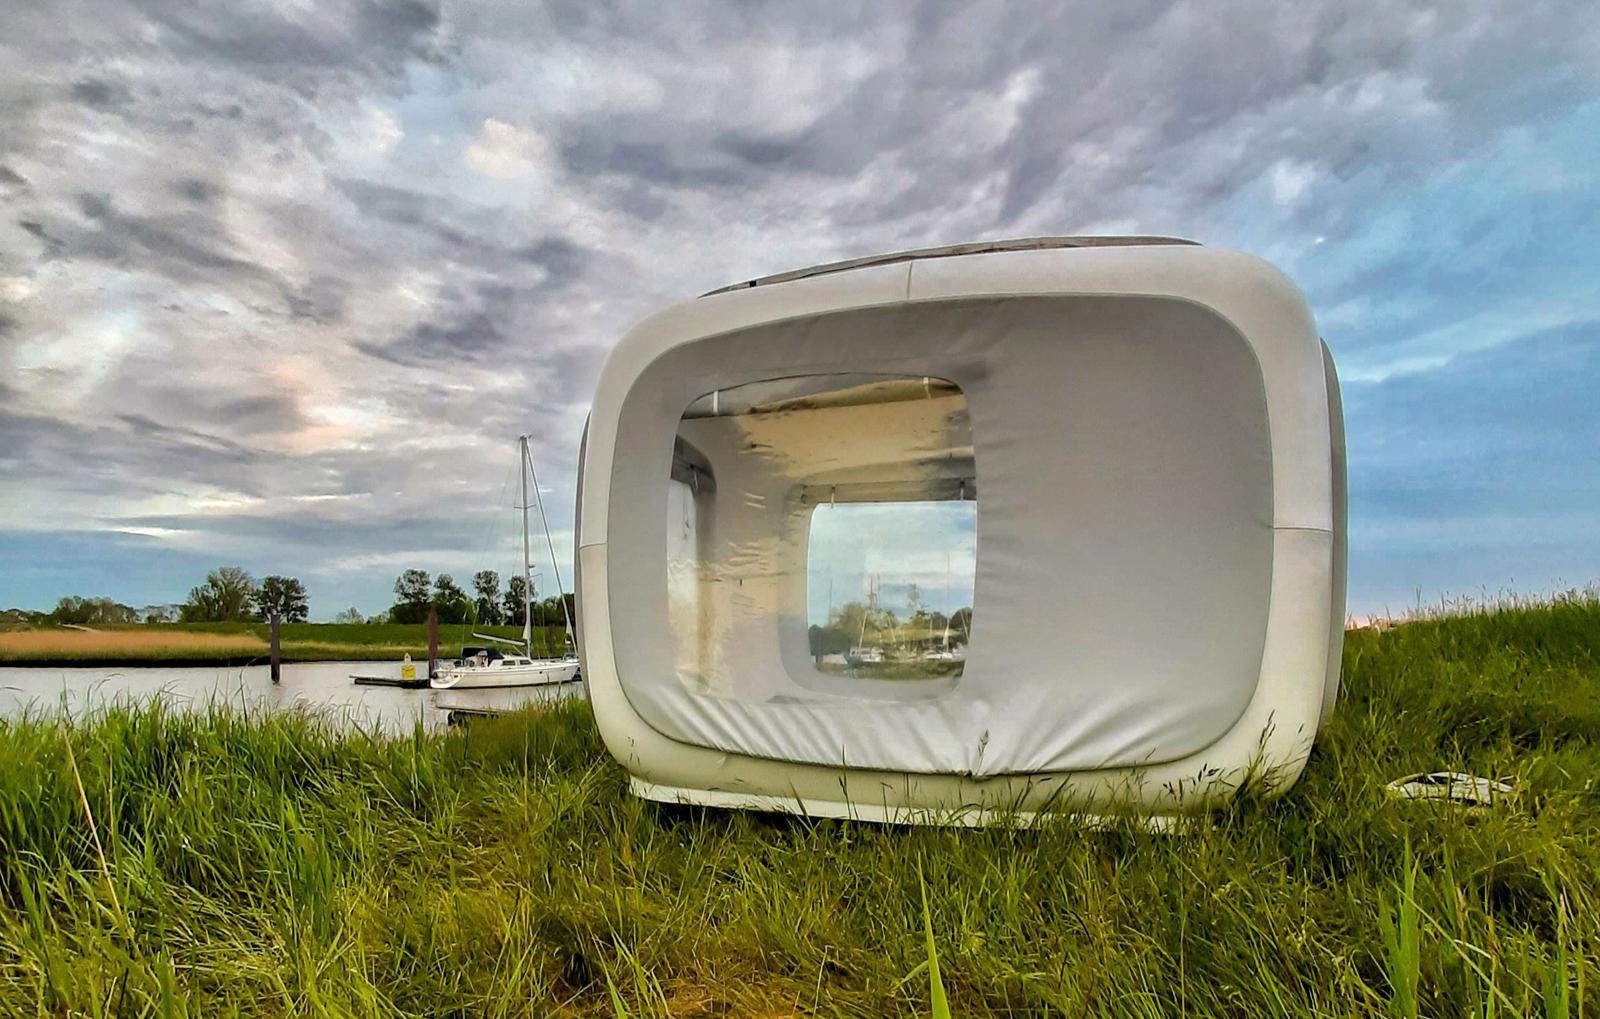 sleeperoo-cube-1-uen-preis-b-fr-so-ottendorf-kap-jakob-bg2